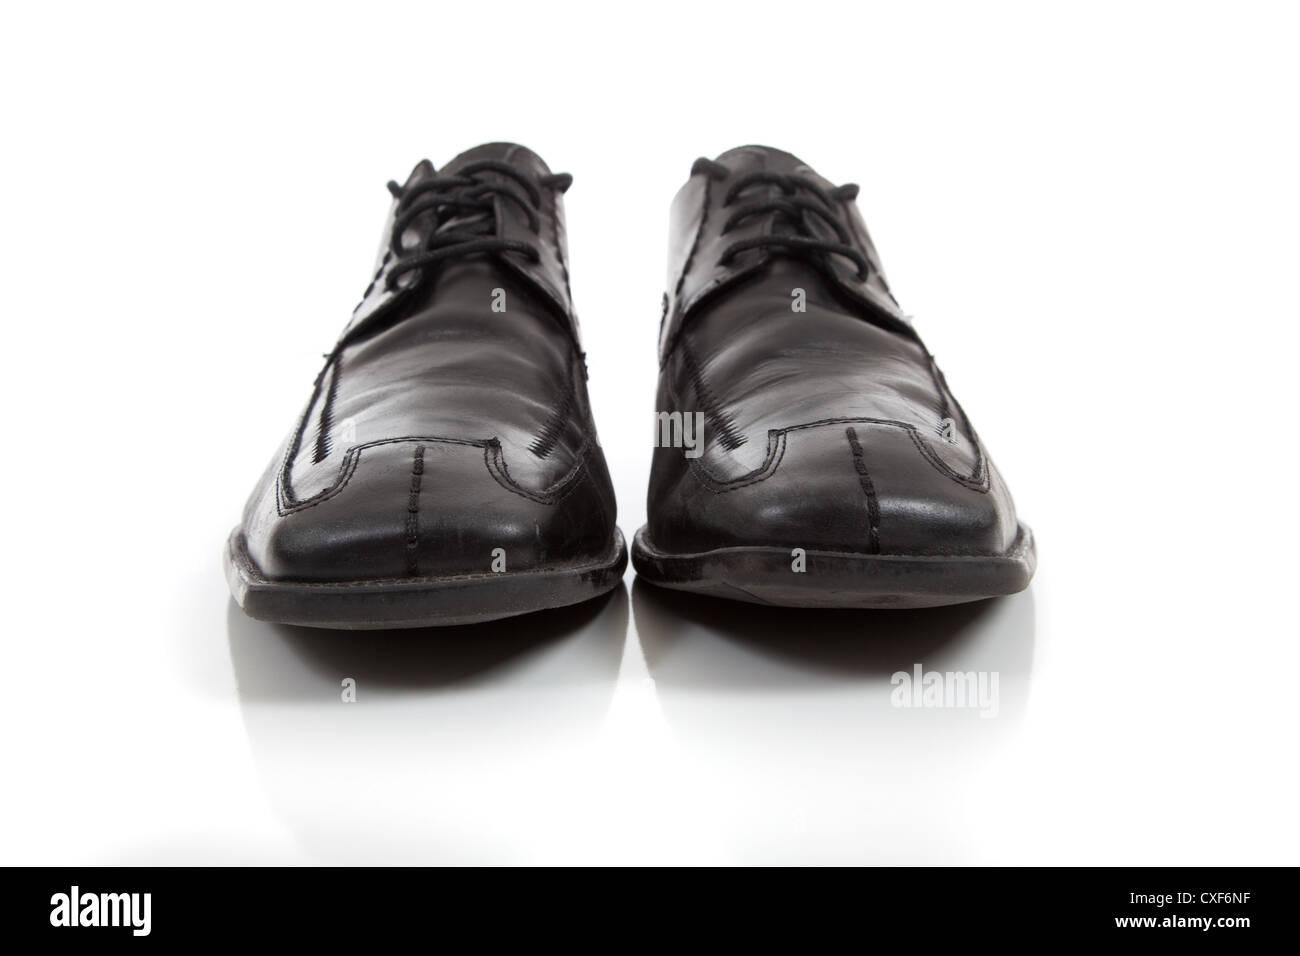 3b074760 Black leather dress shoes on a white bathroom Stock Photo: 50736379 ...